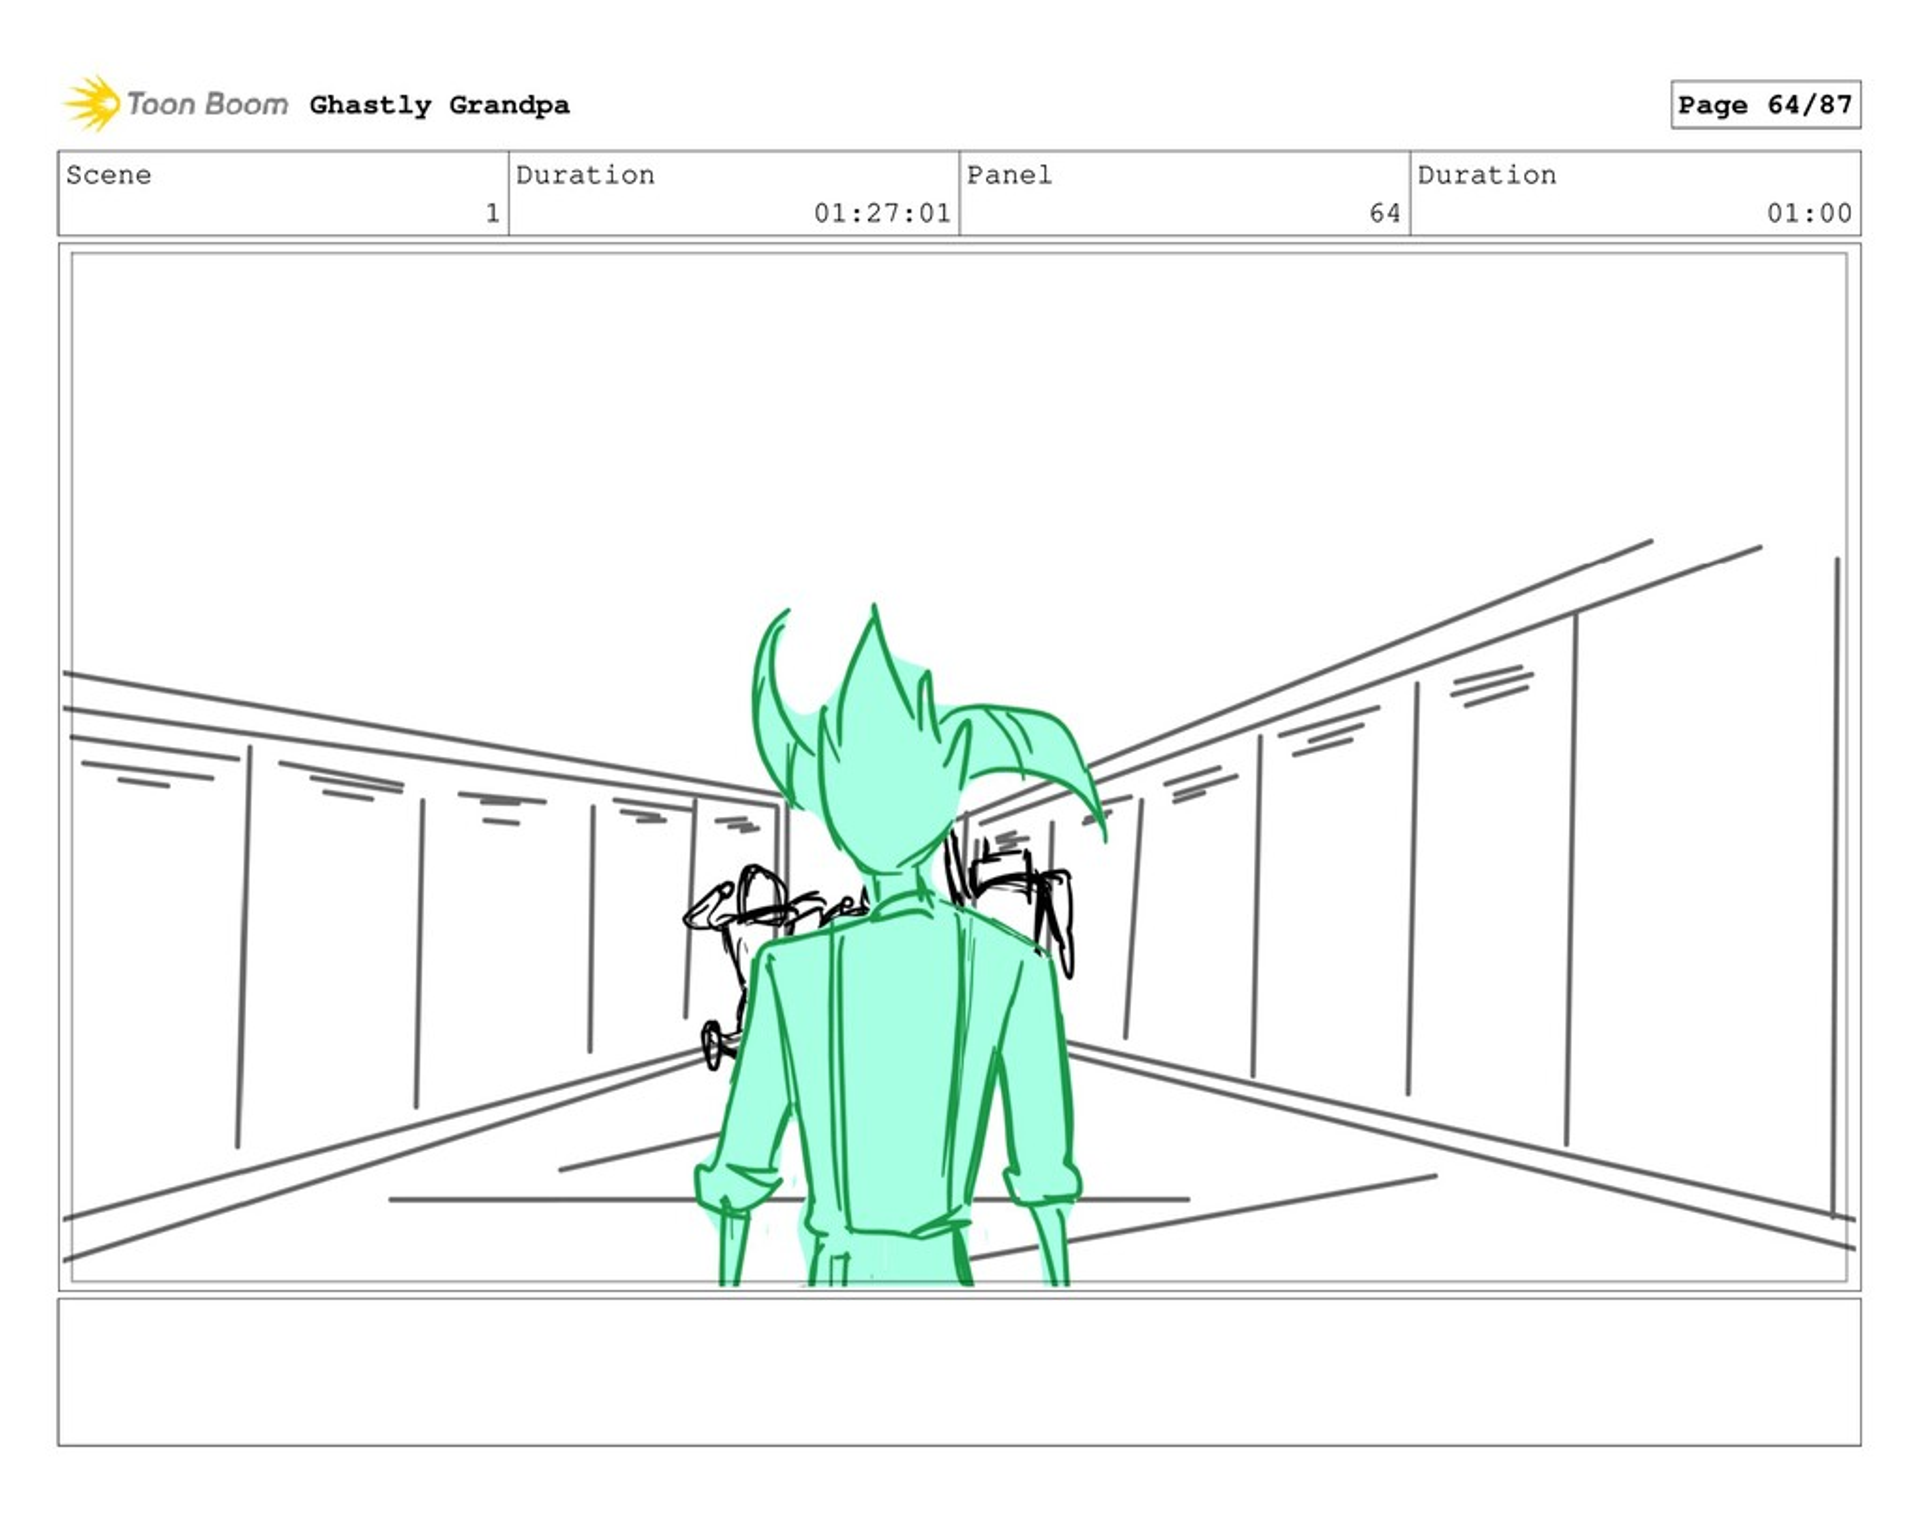 Scene 1 Duration 01:27:01 Panel 64 Duration 01:...